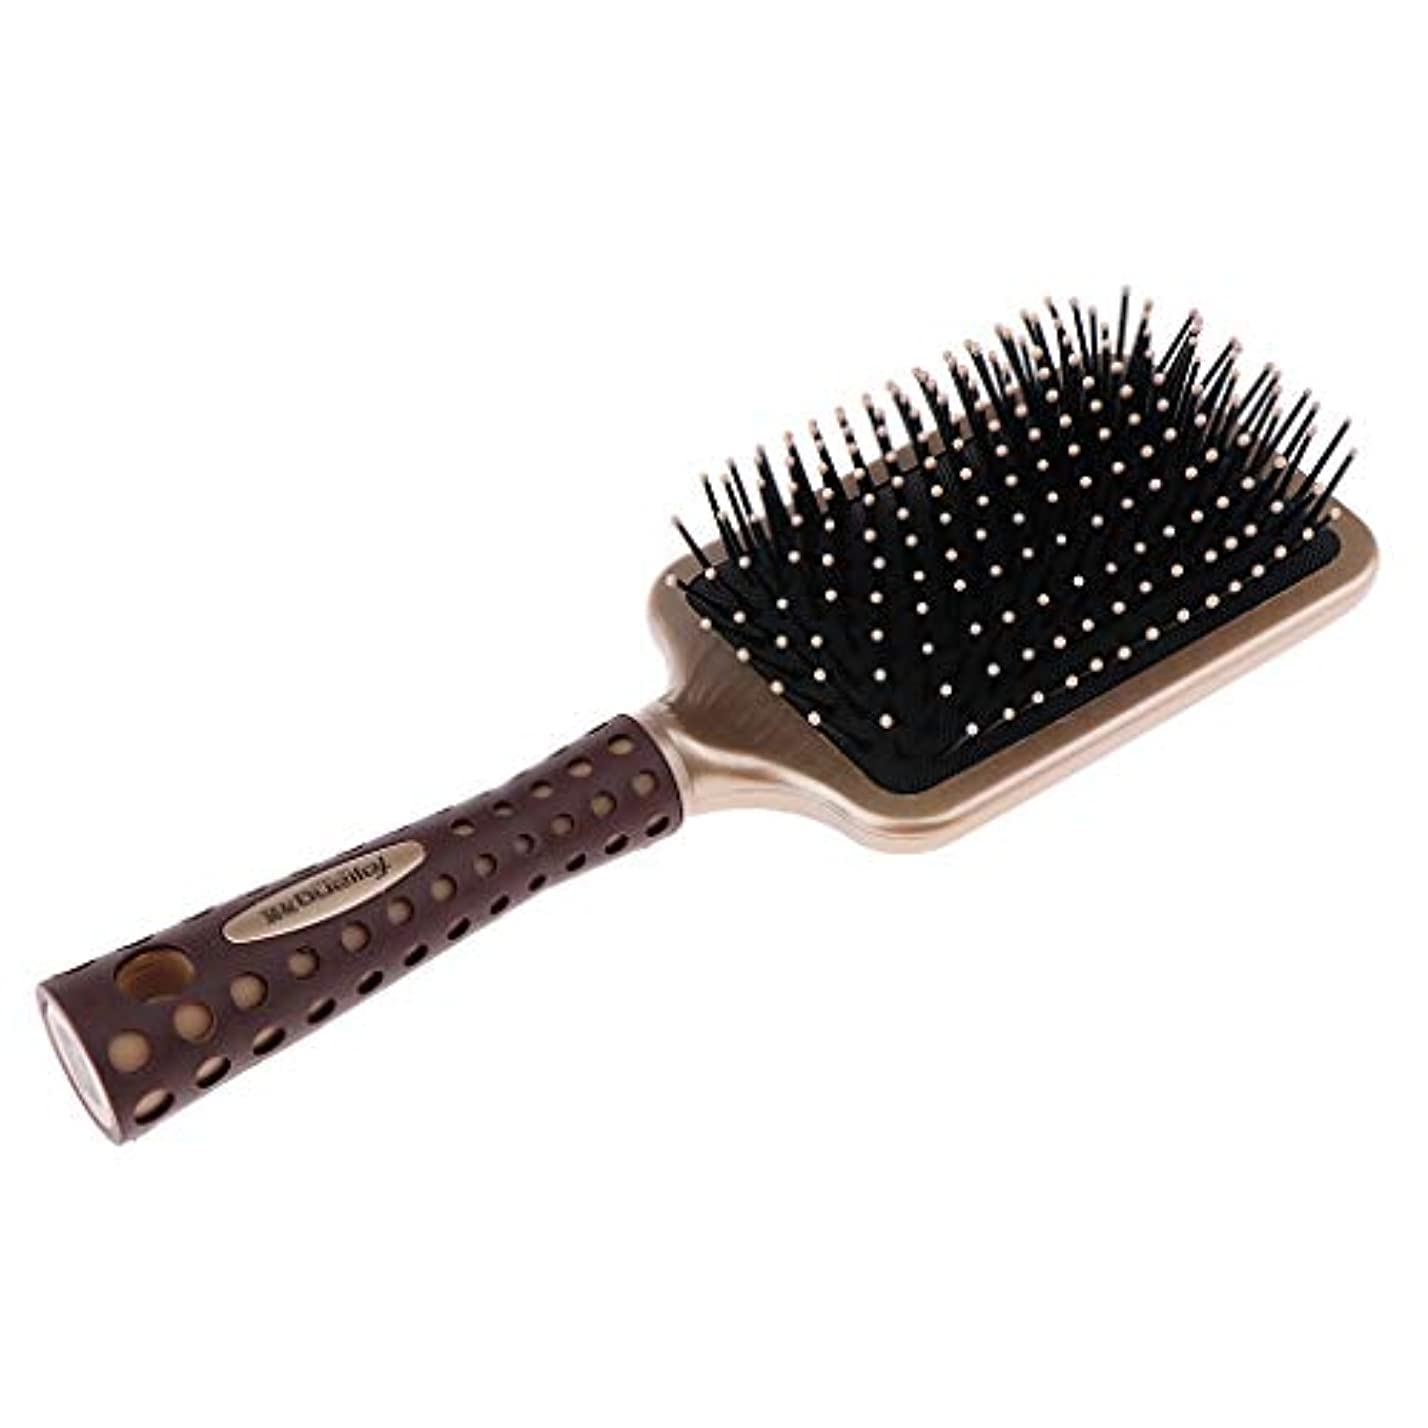 B Baosity 静電防止櫛 クッションヘアブラシ 頭皮マッサージ プロ ヘアーサロン 美容師 2サイズ選べ - L